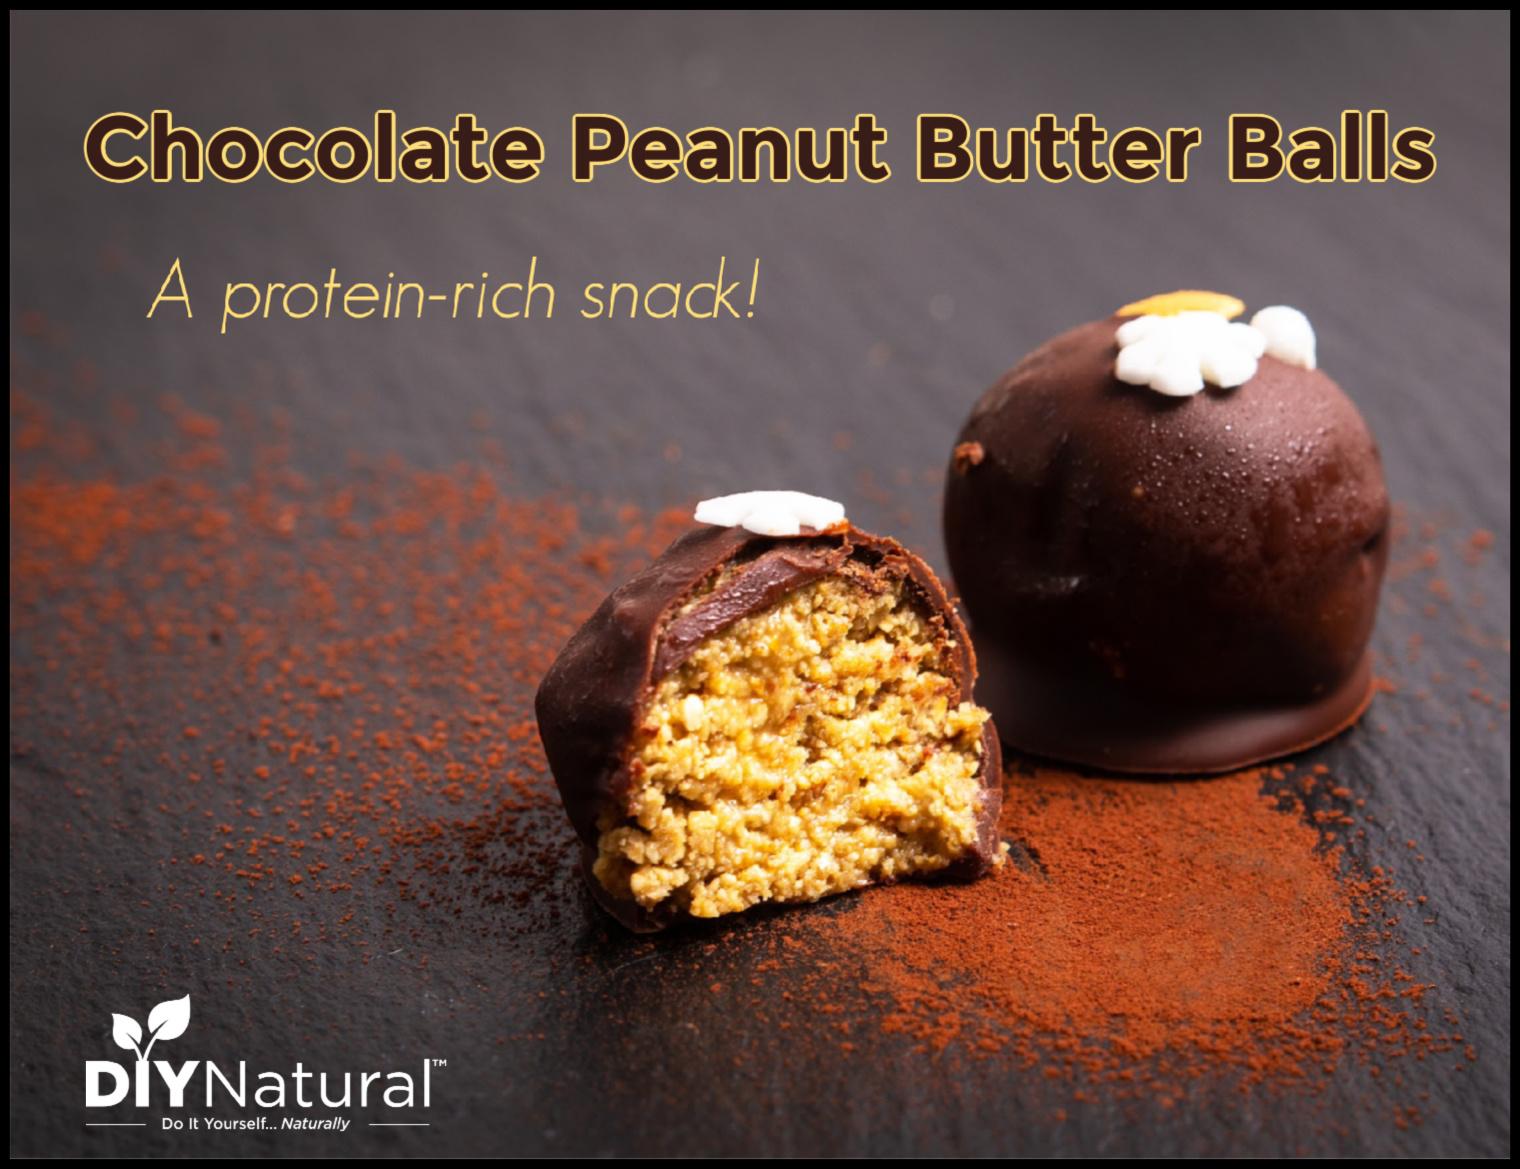 Yummy, Protein-Rich Chocolate Peanut Butter Balls